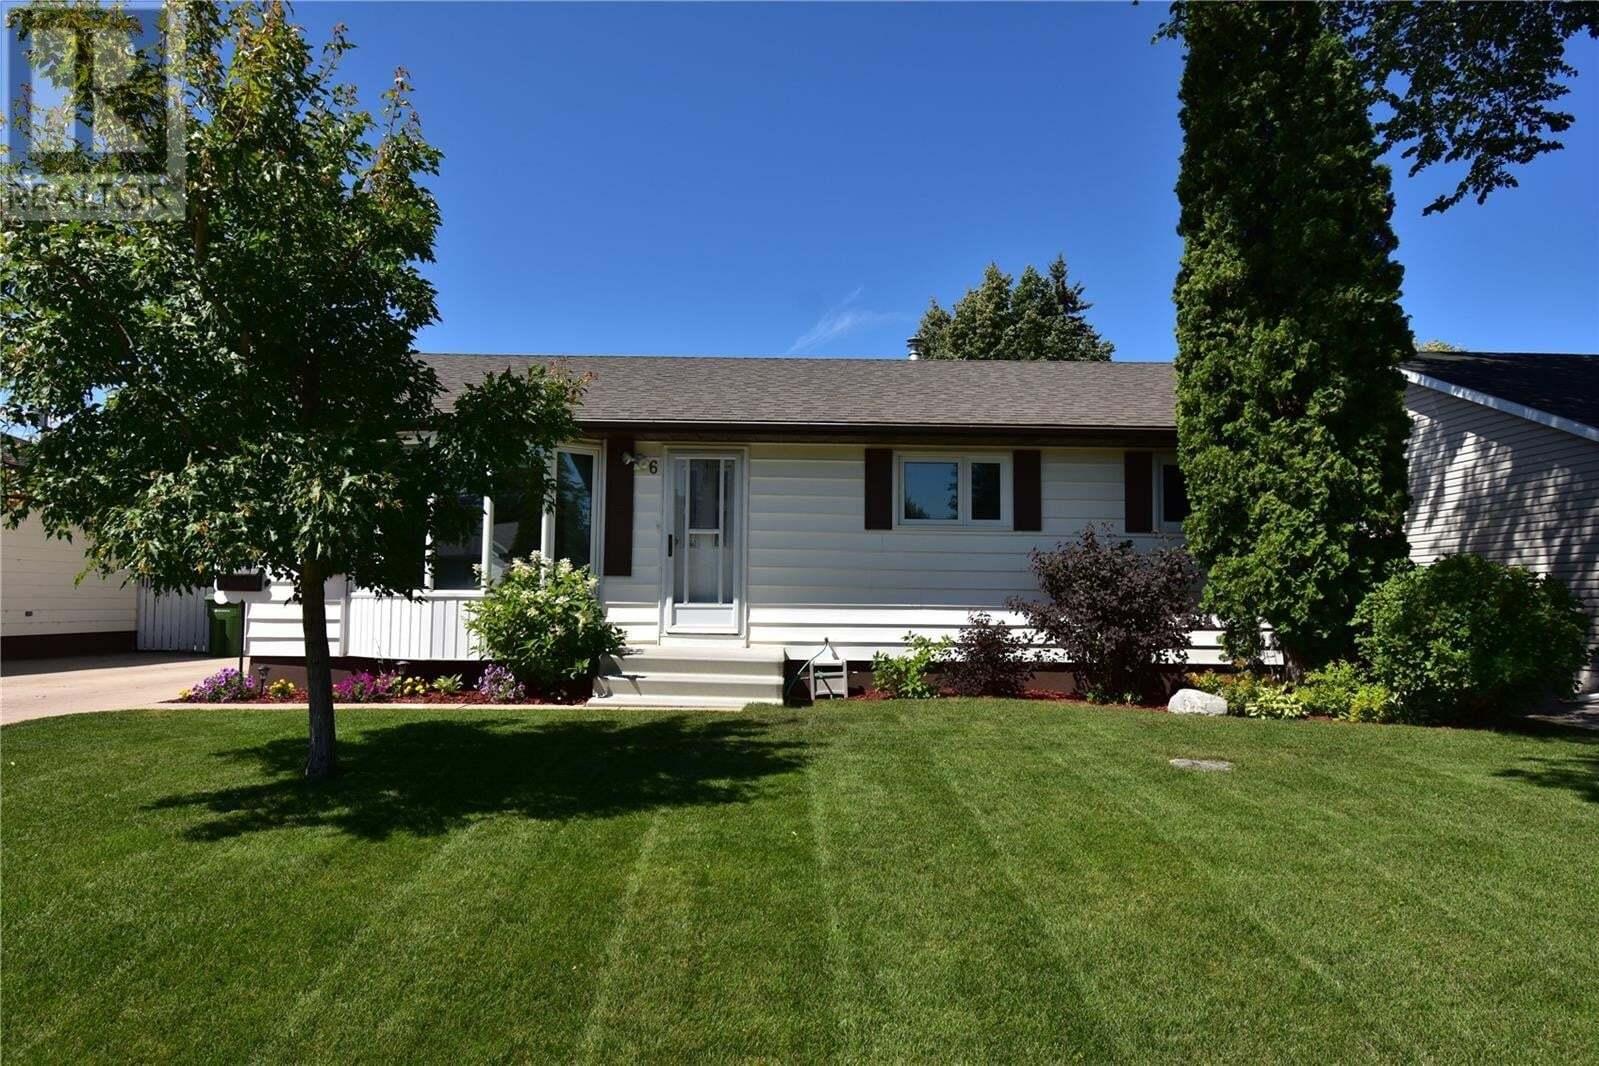 House for sale at 6 Maclean Cres Saskatoon Saskatchewan - MLS: SK819786